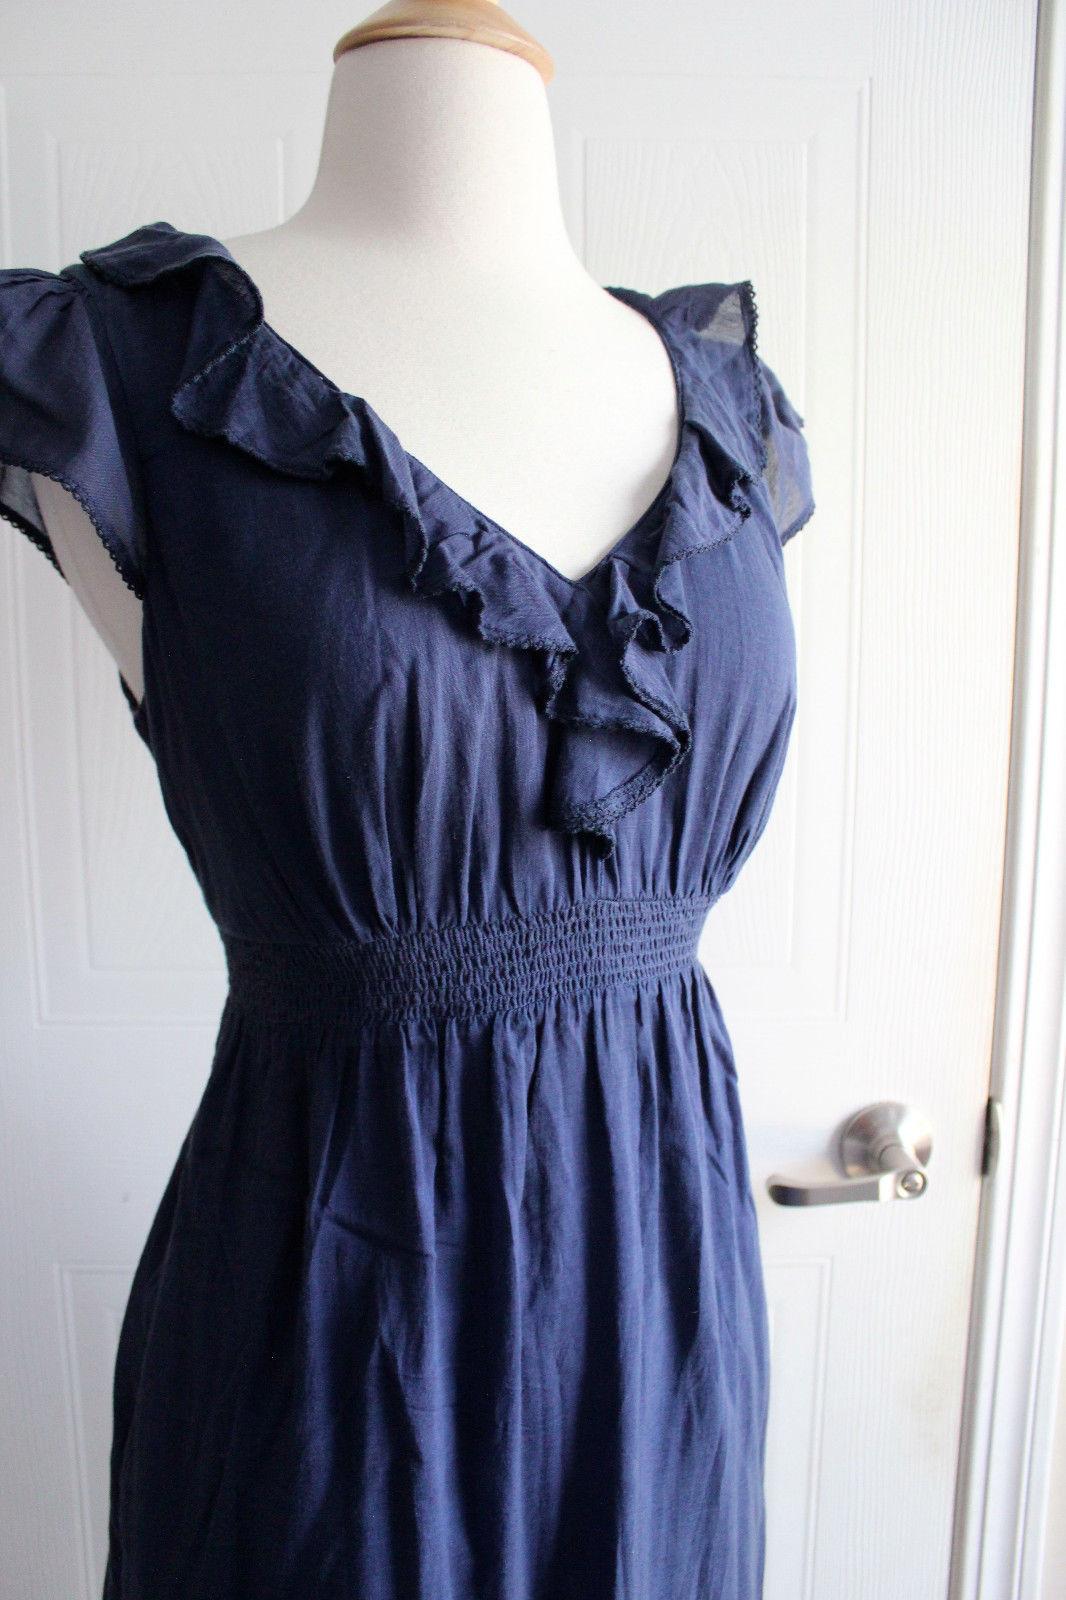 Anthropologie Maeve Navy Blue Ruffle Short Cap Sleeves Dress Sz 4